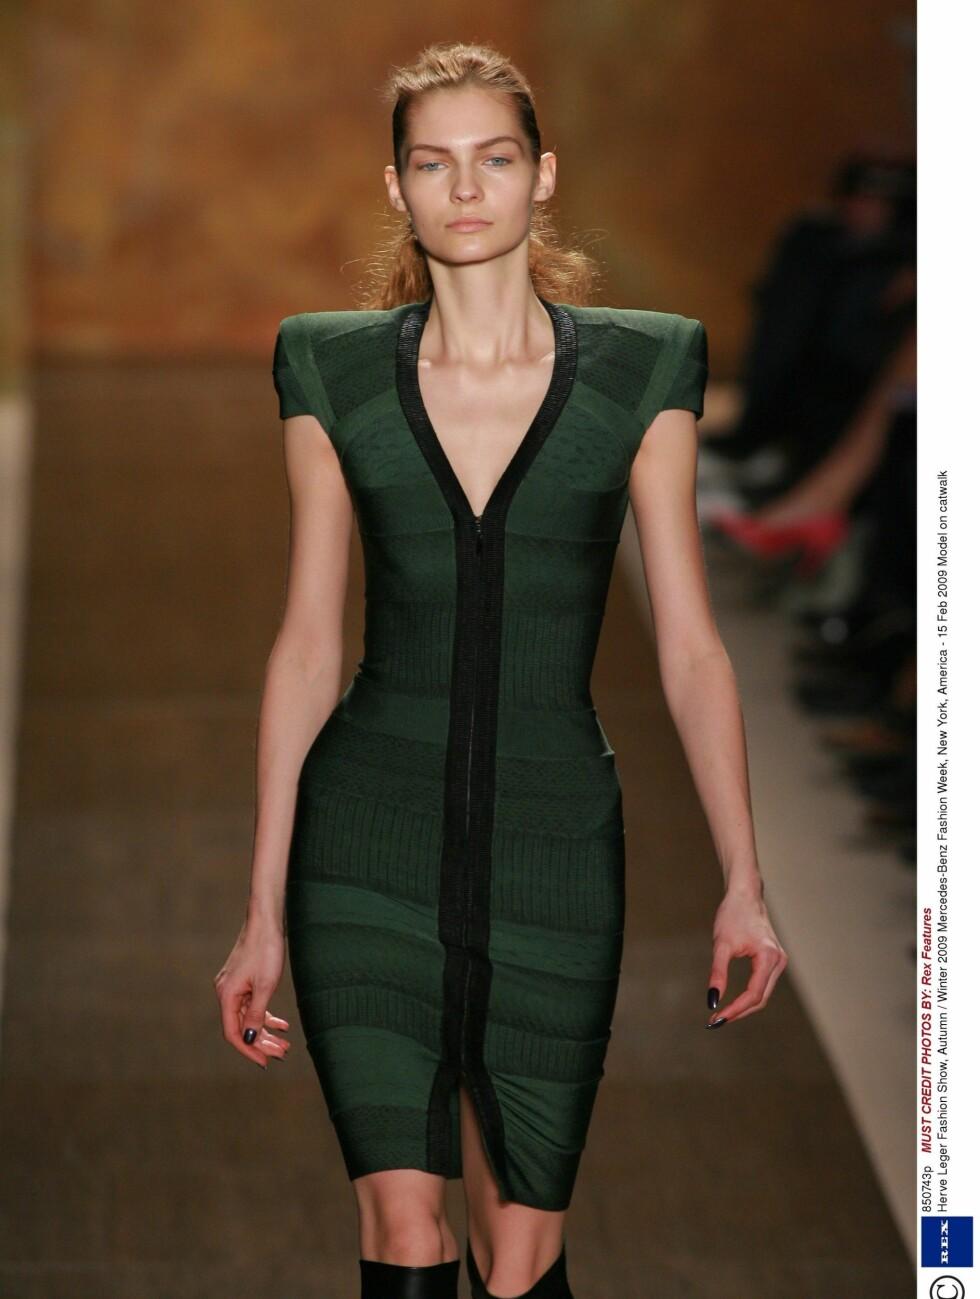 GLIDELÅS MIDT PÅ: Hervè Leger viste også kjoler med glidelåser under New York Fasjion Week denne uken.   Foto: All Over PressAll